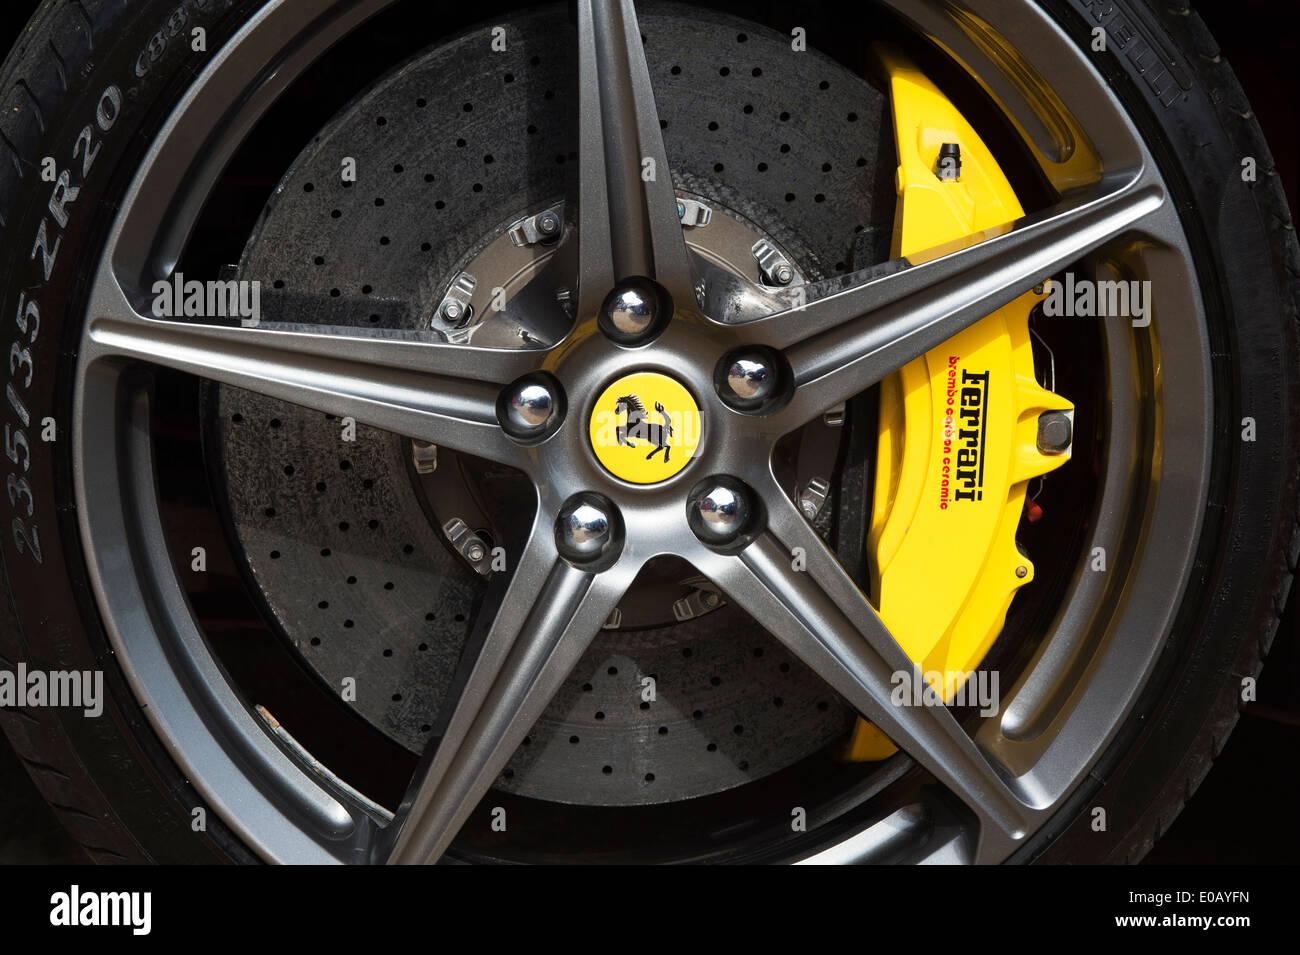 Porsche Cayenne Carbon Ceramic Brakes Bmw M Carbon Keramik